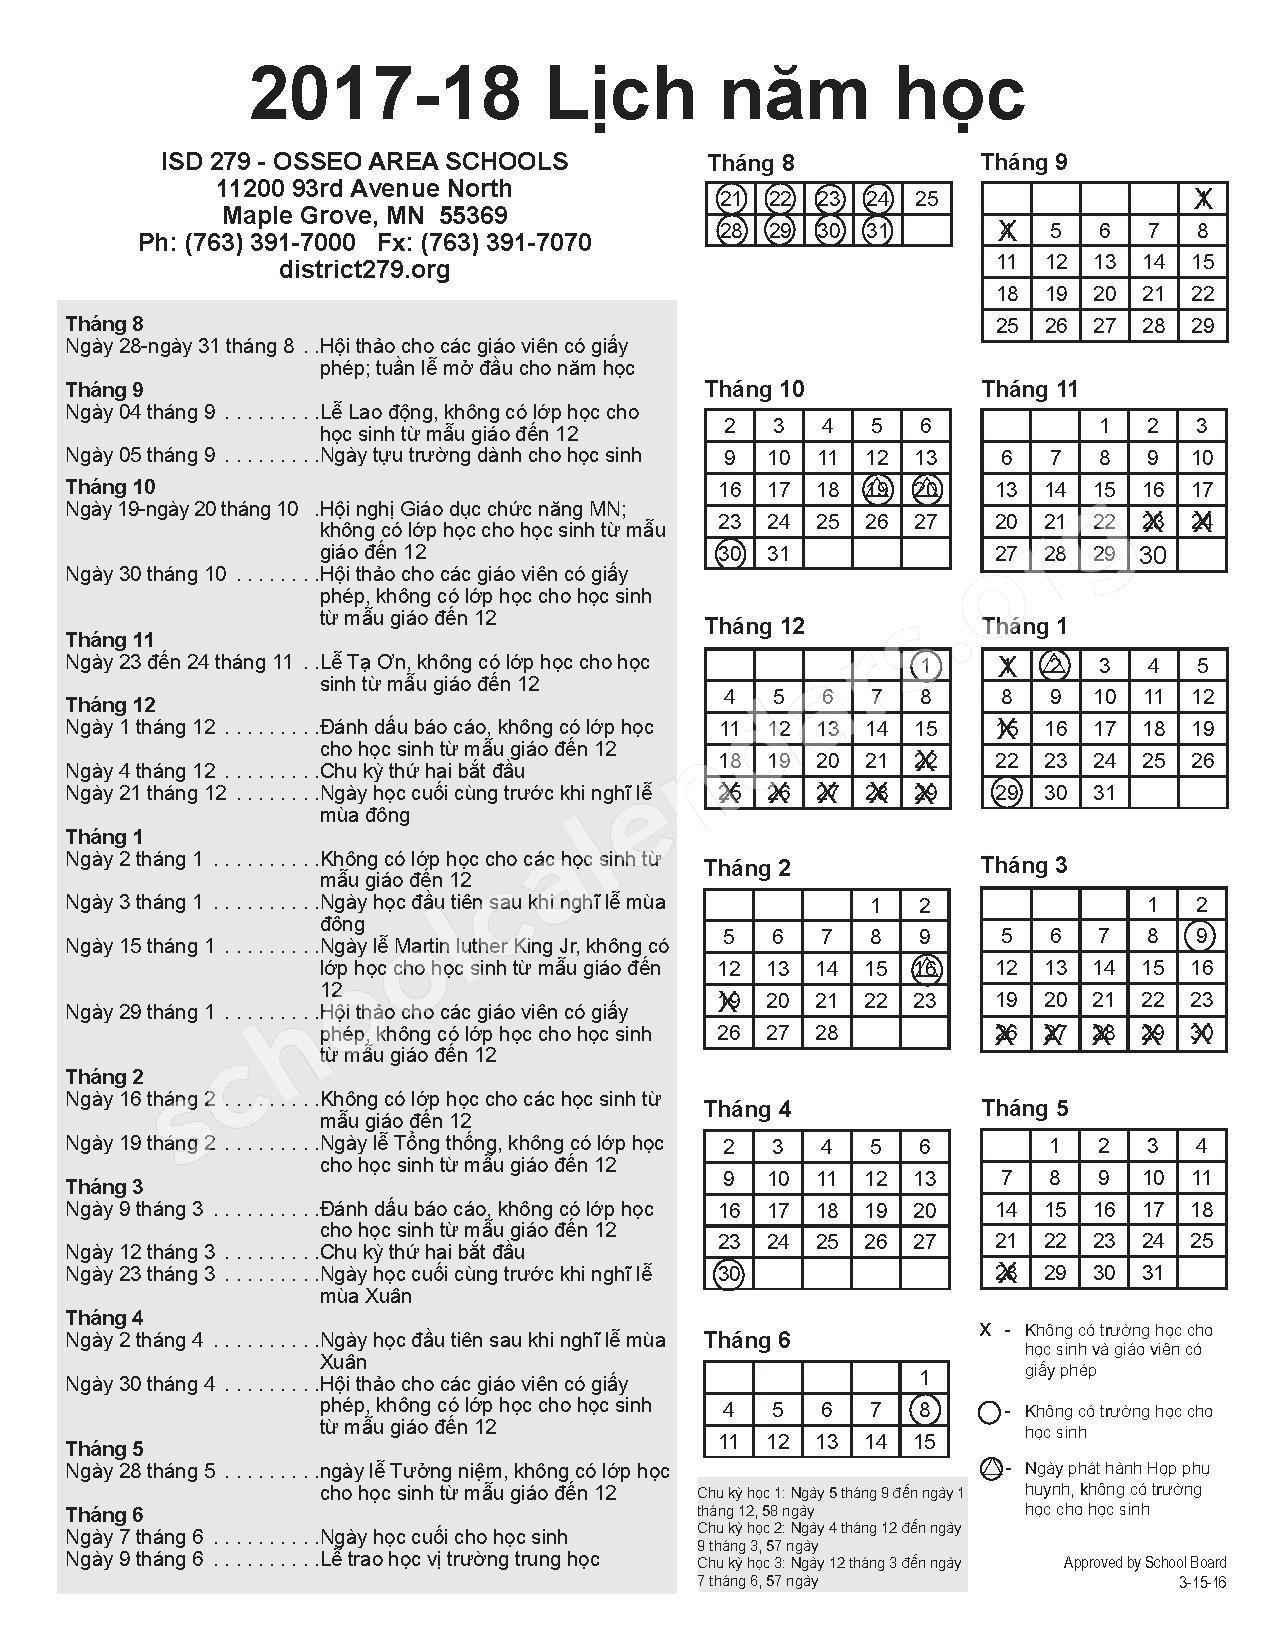 2017 - 2018 Vietnamese Calendar – Zanewood Community School – page 1